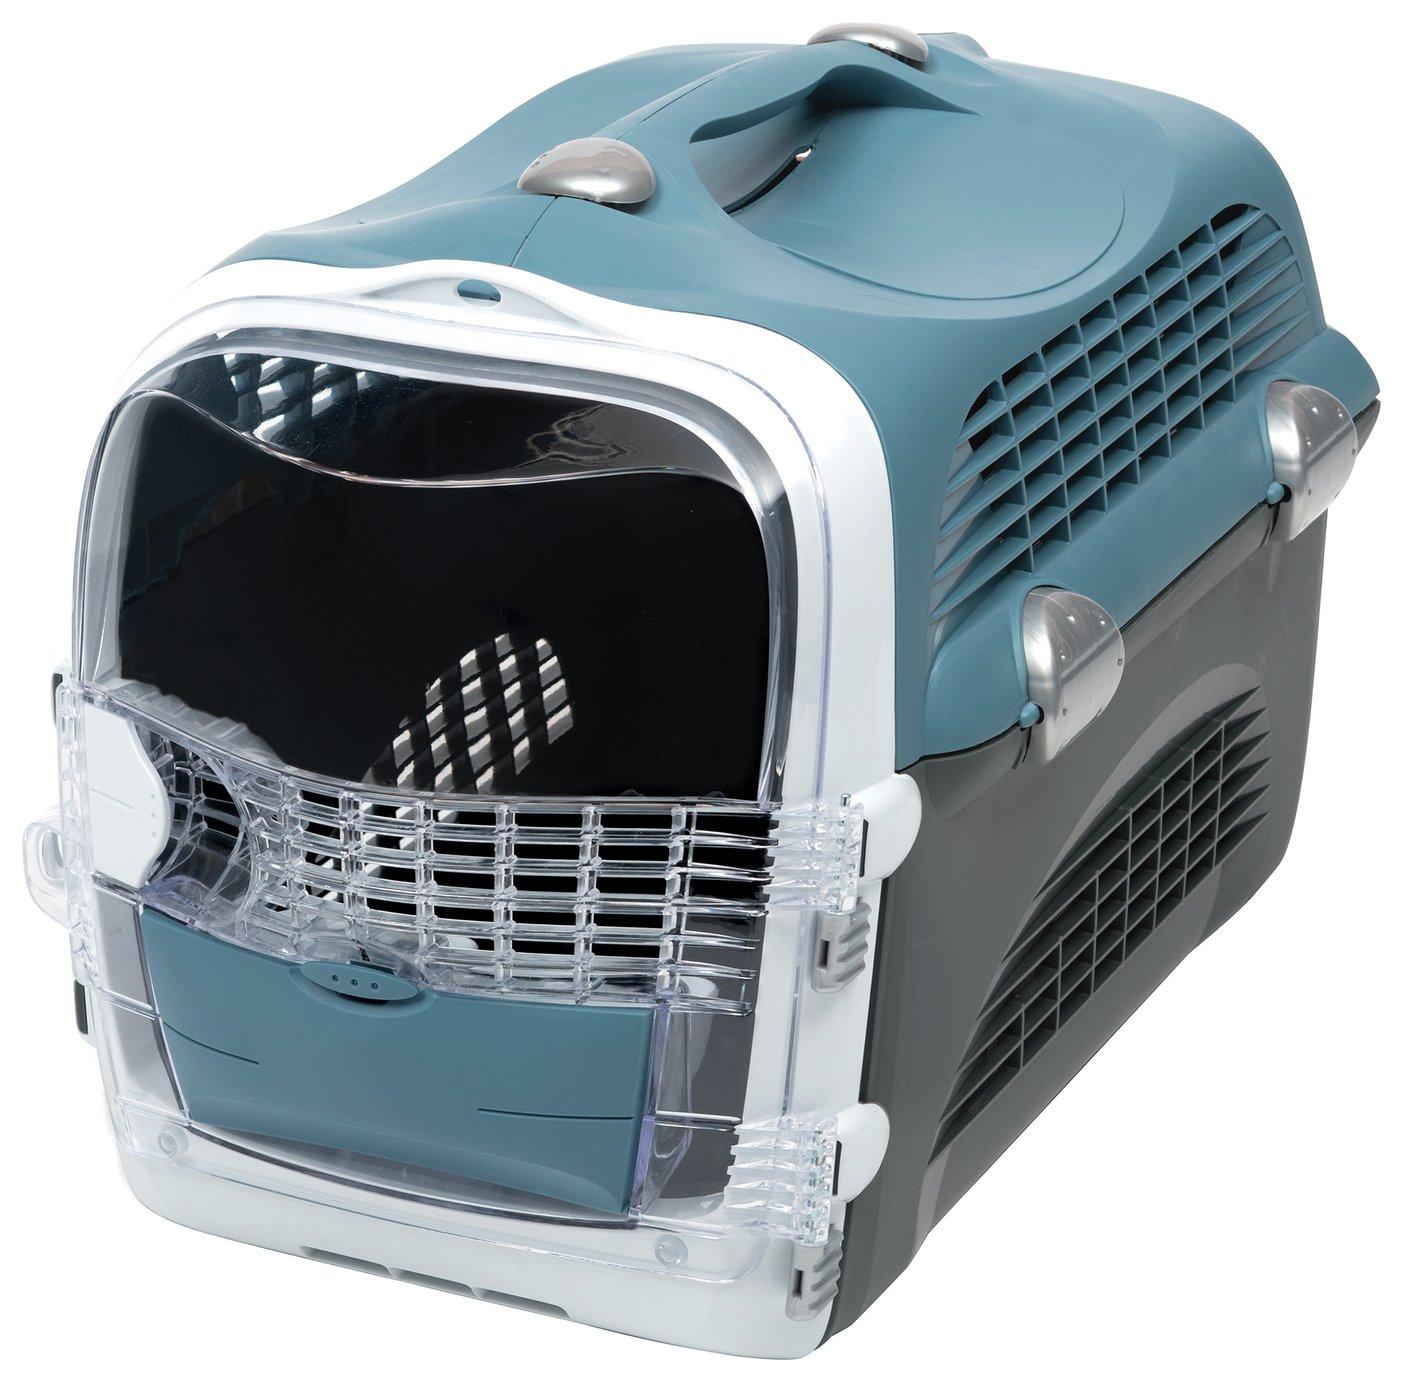 Catit Cabrio Pet Carrier - Blue/Grey